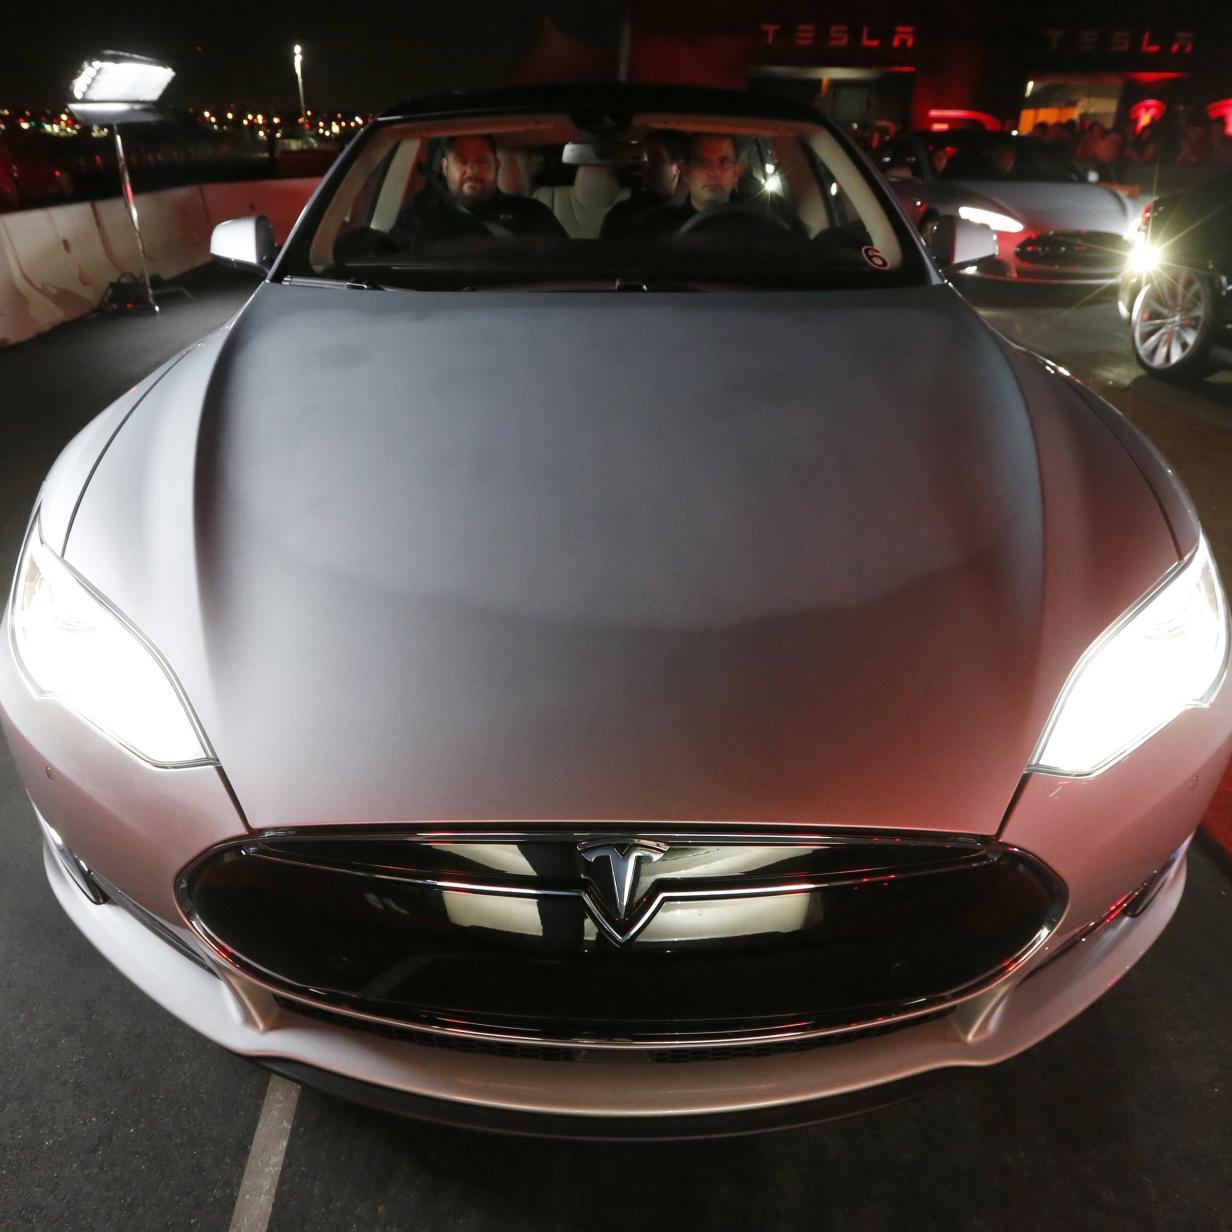 Display tot, Auto lädt nicht: Probleme mit älteren Teslas